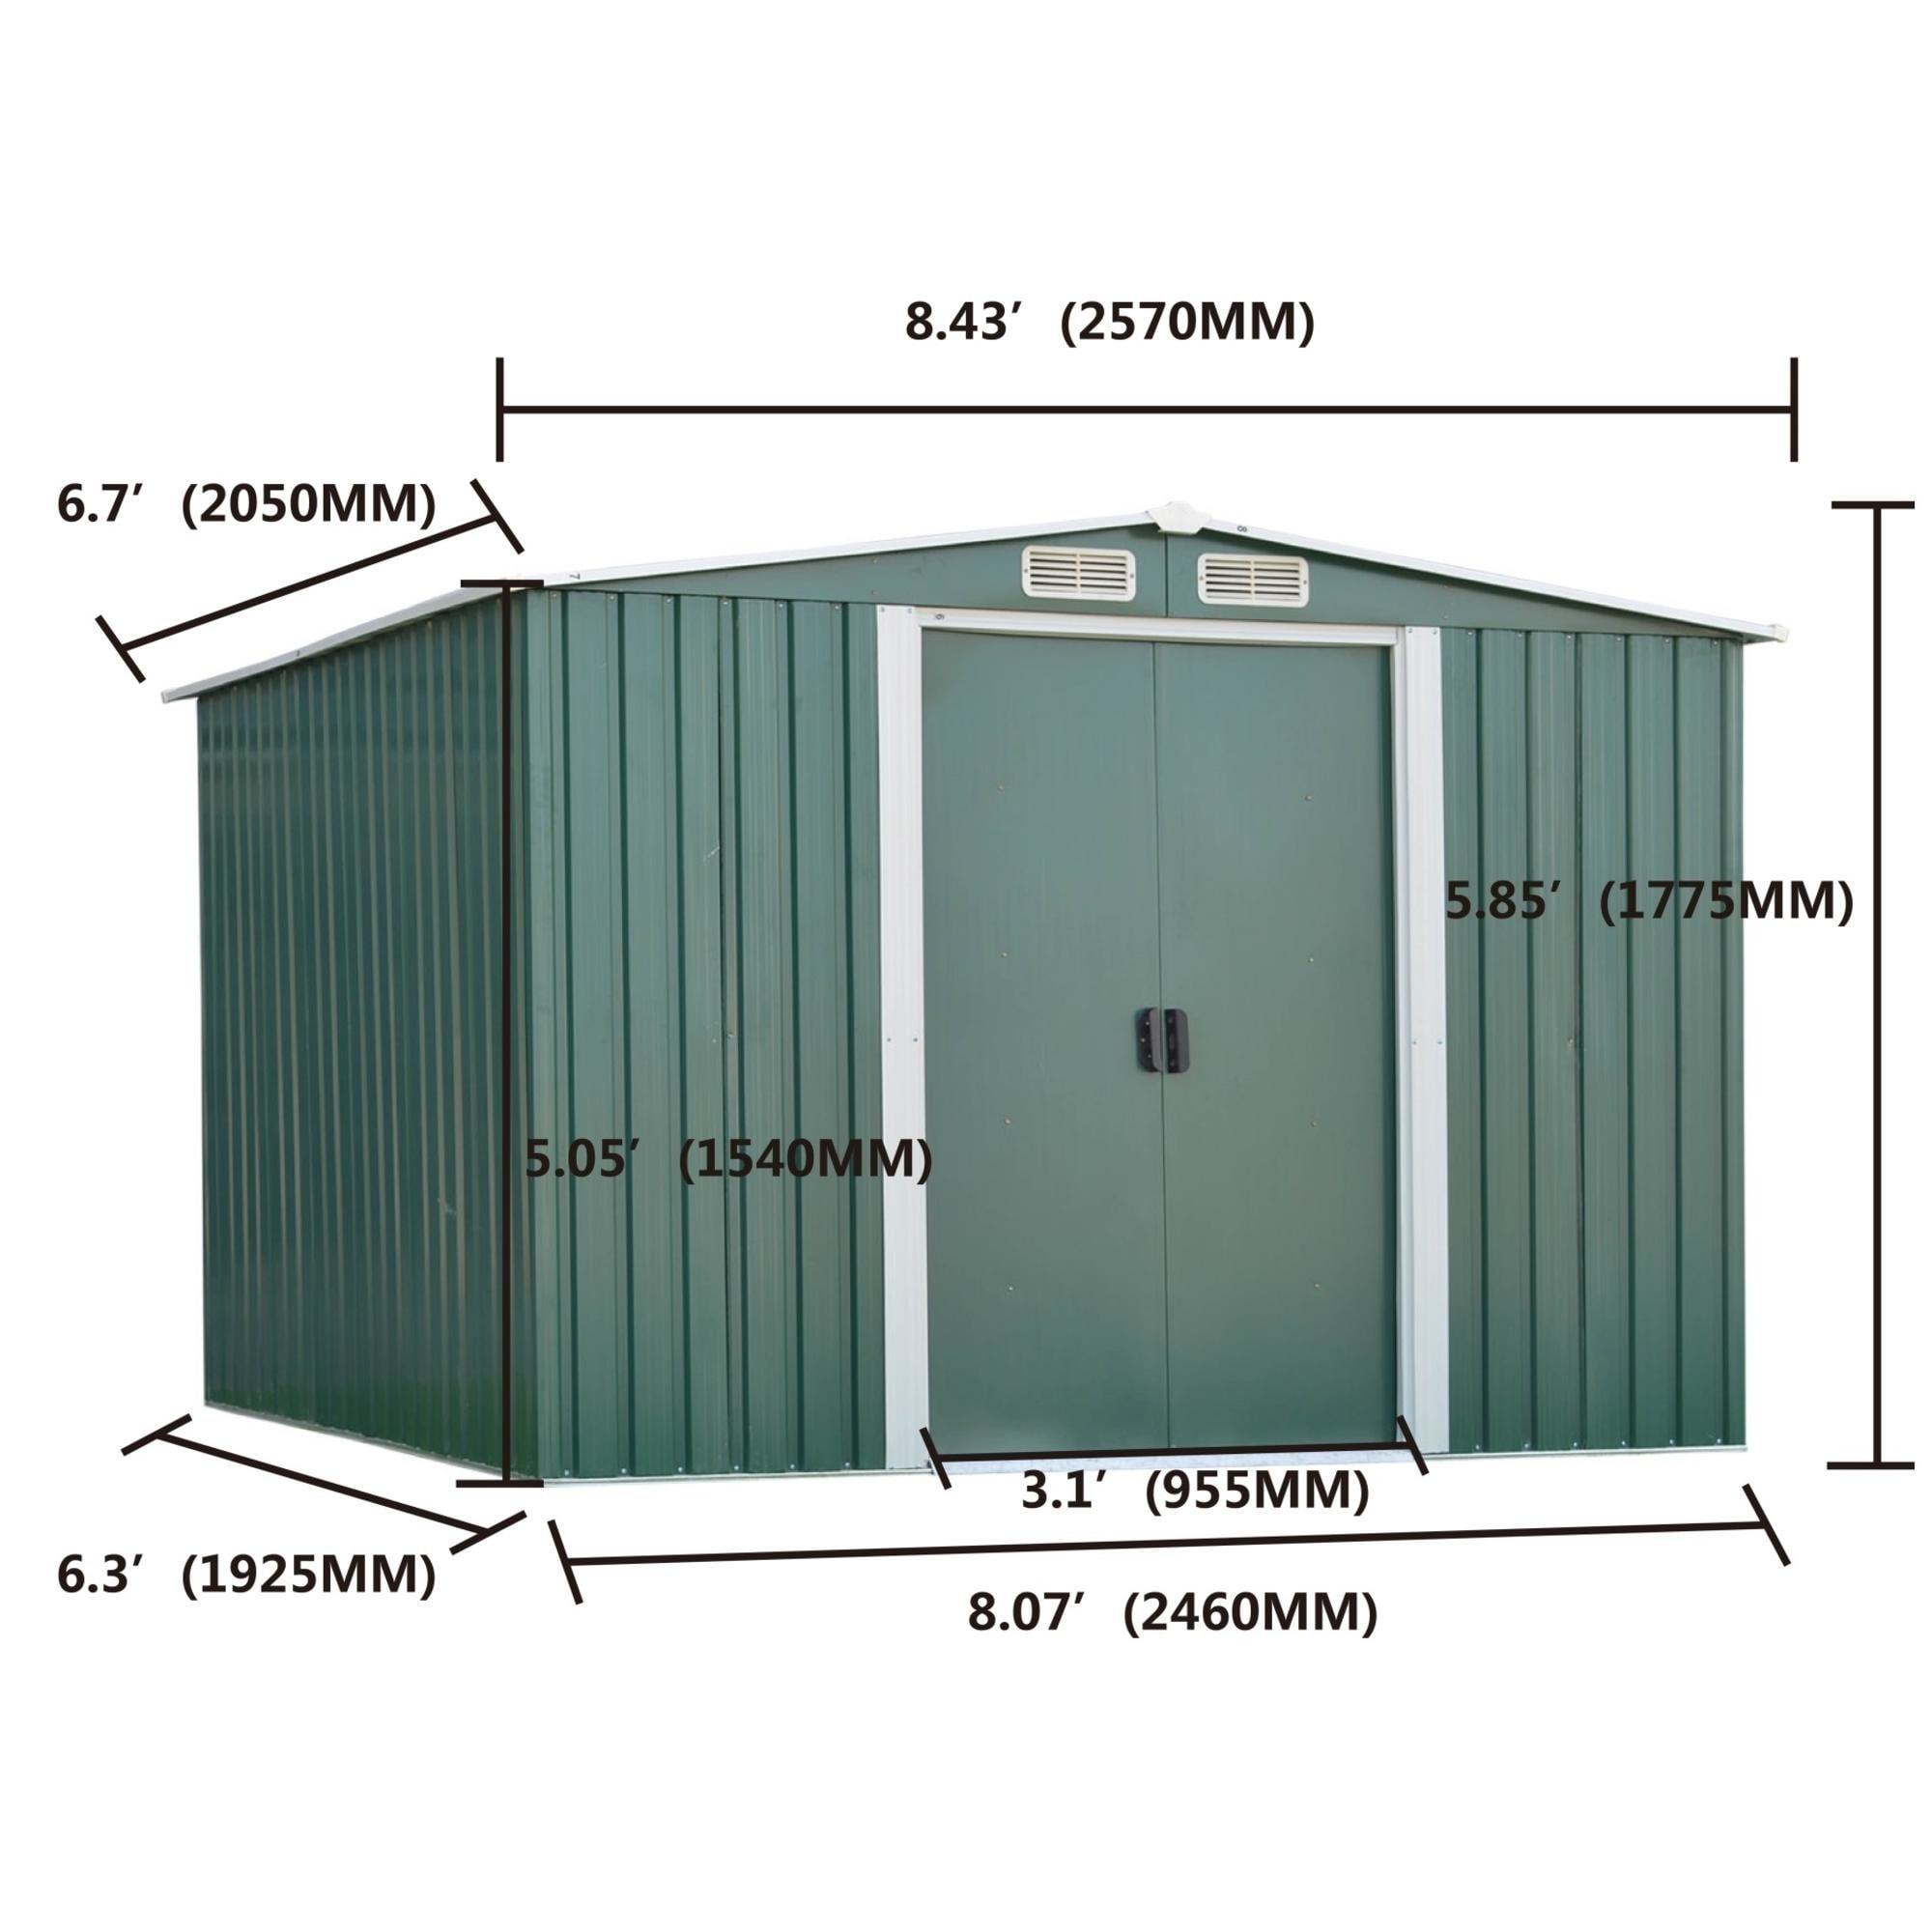 kinbor 8' x 6' outdoor garden storage shed tool house backyard lawn  building garage